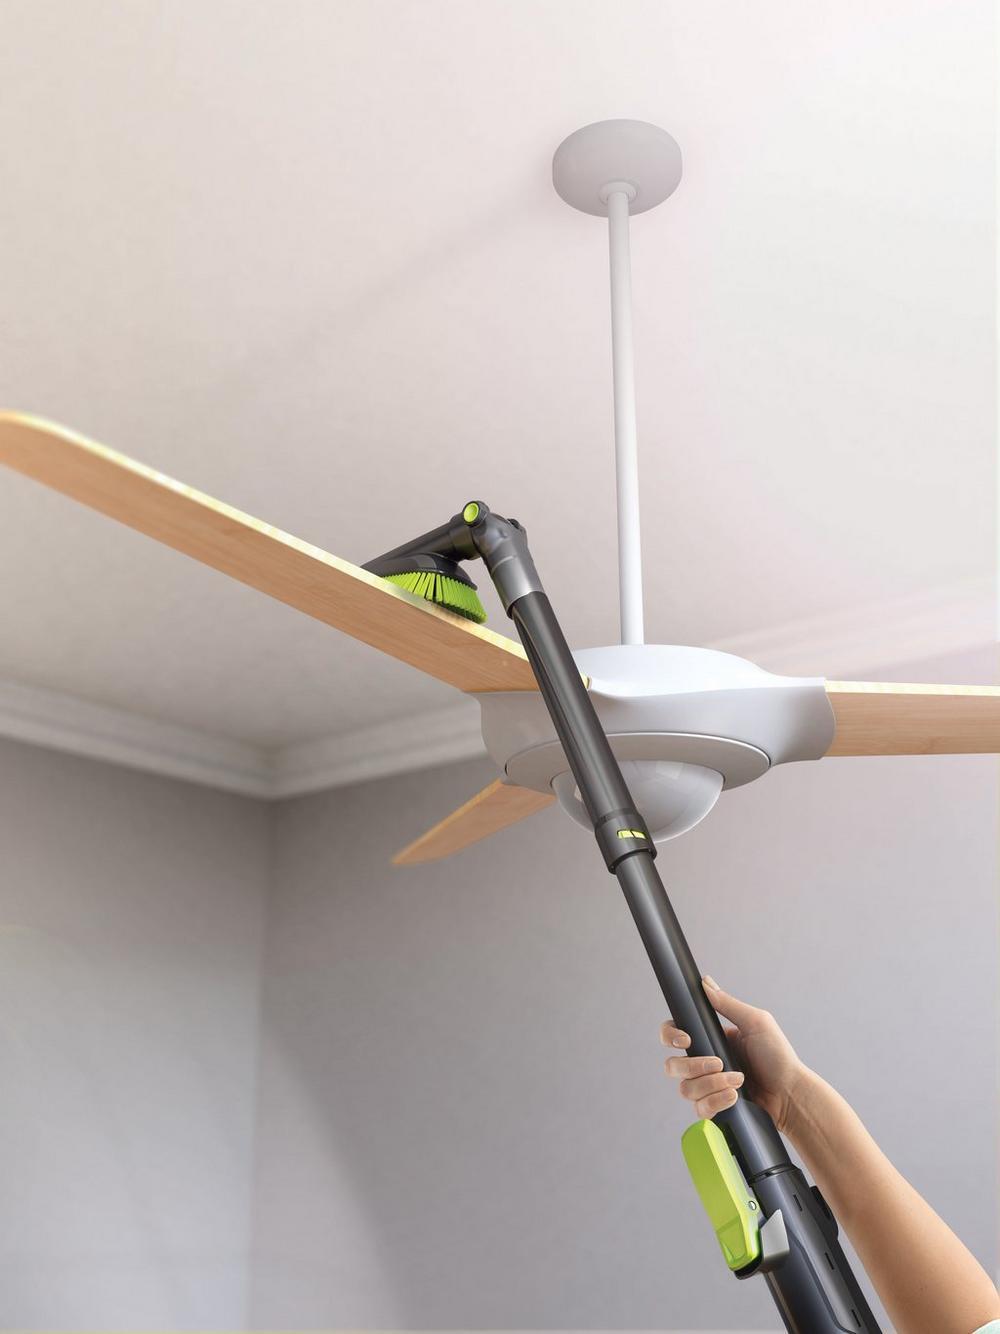 Air Lift Deluxe Pet Upright Vacuum5